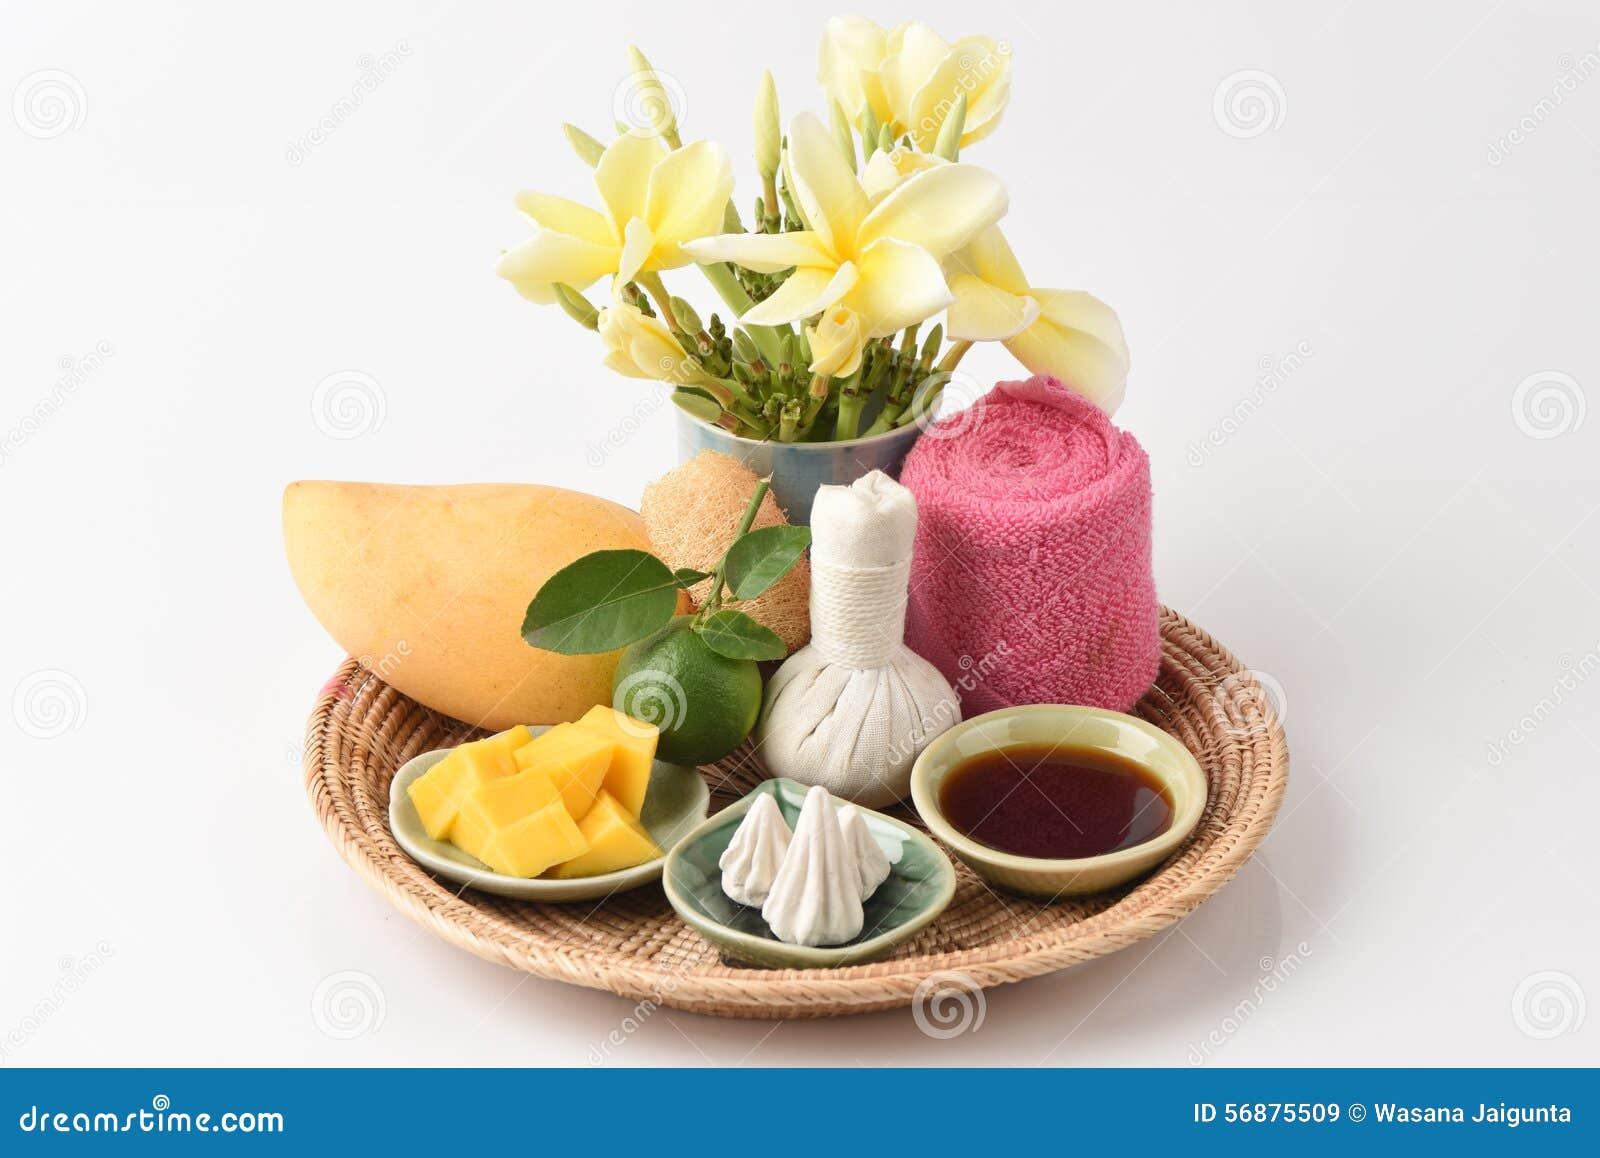 Gezichtsmasker met mango, kalk honing en hygiënisch, DIN-sor pong (Thaise naam)